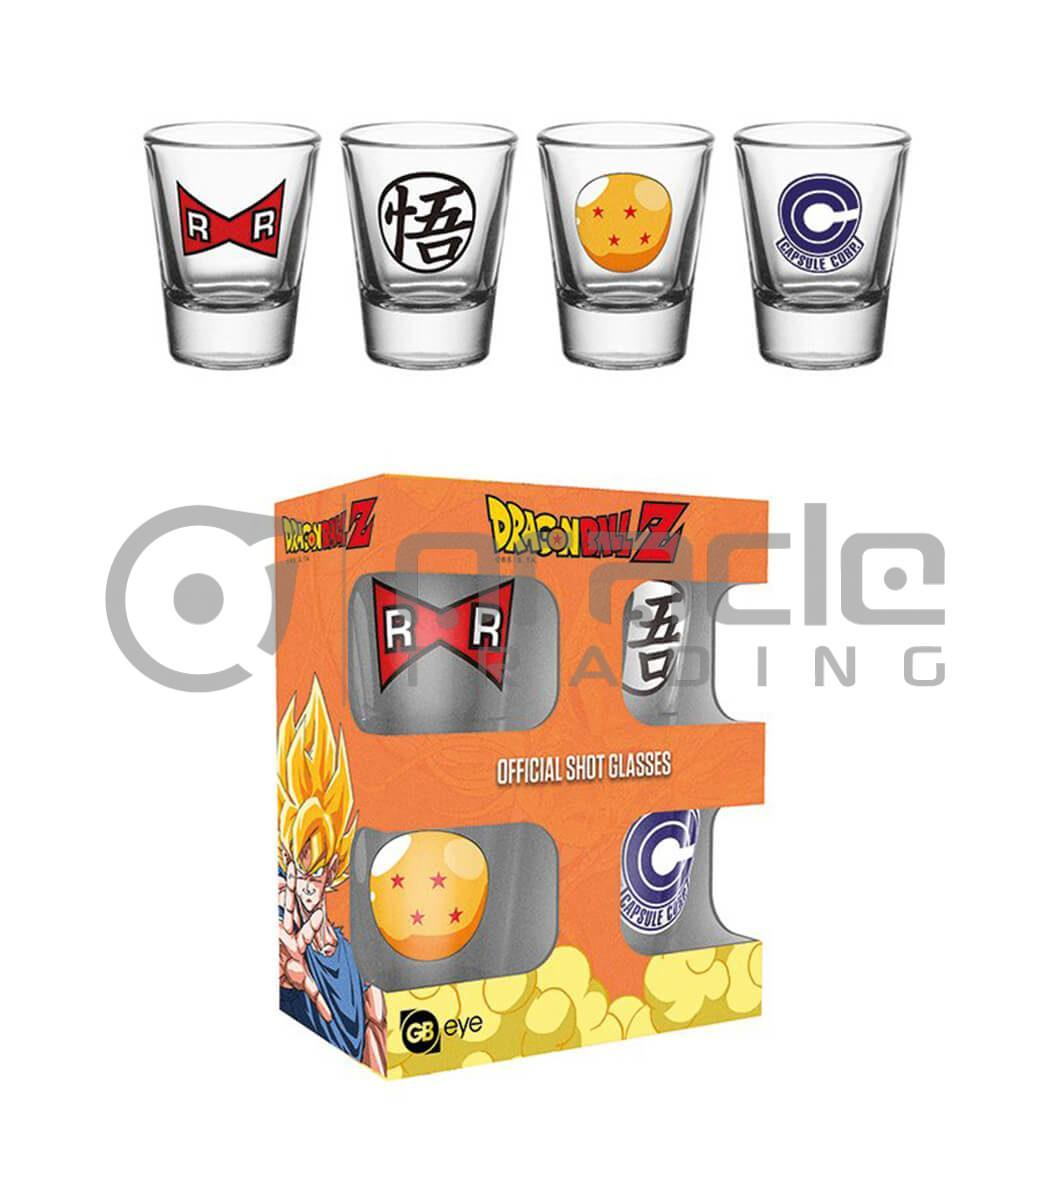 Dragon Ball Z Shot Glass Set (4-Pack)